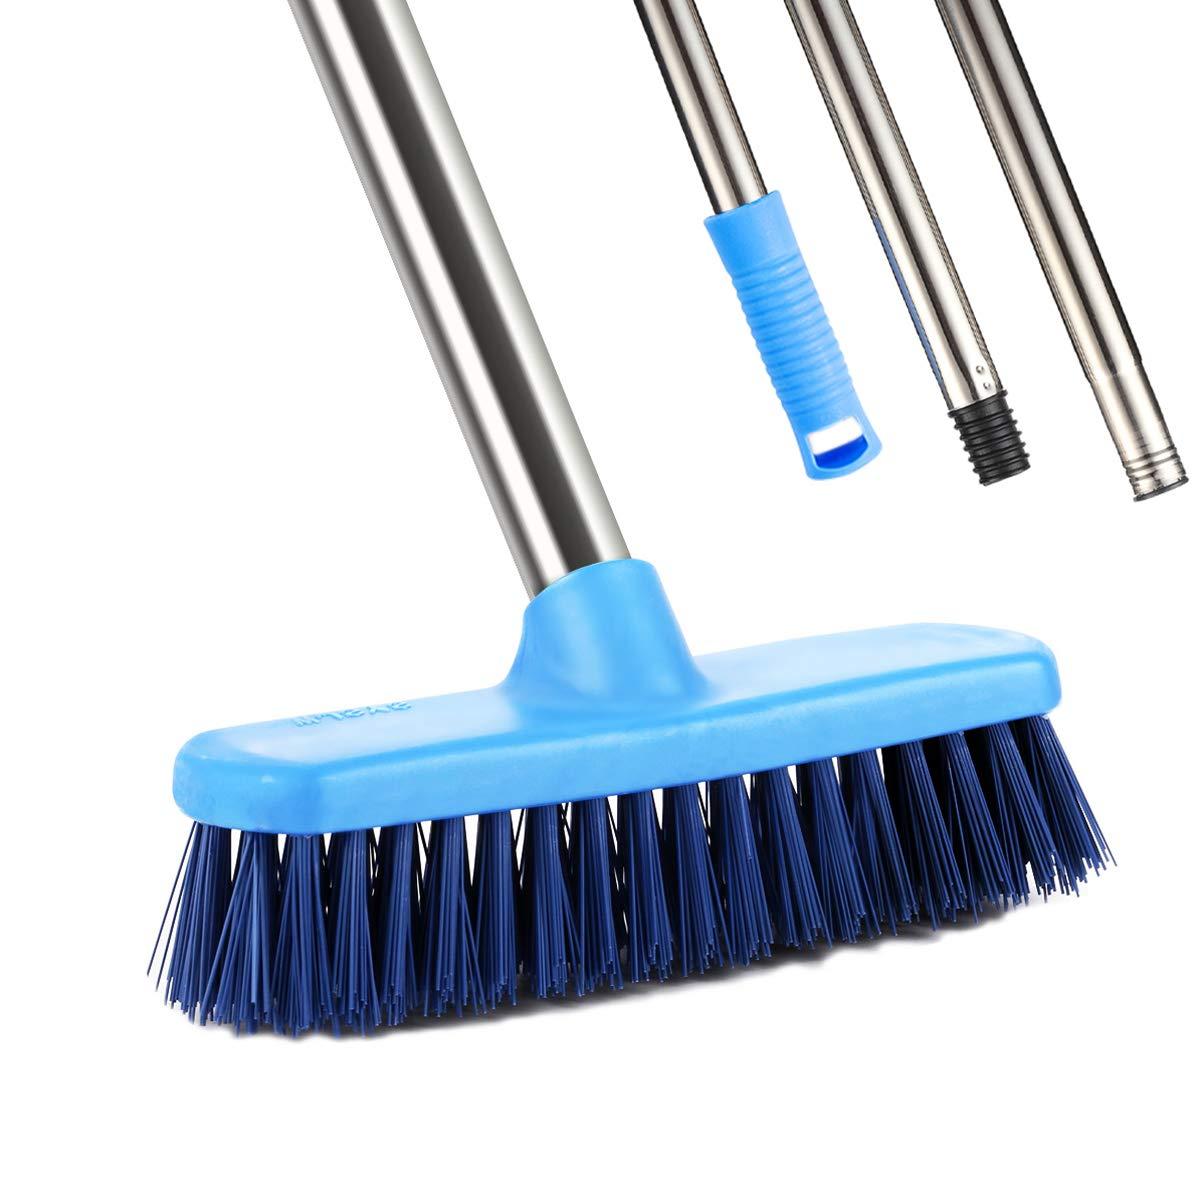 floor scrub brush ycute 47 stainless steel long handle. Black Bedroom Furniture Sets. Home Design Ideas